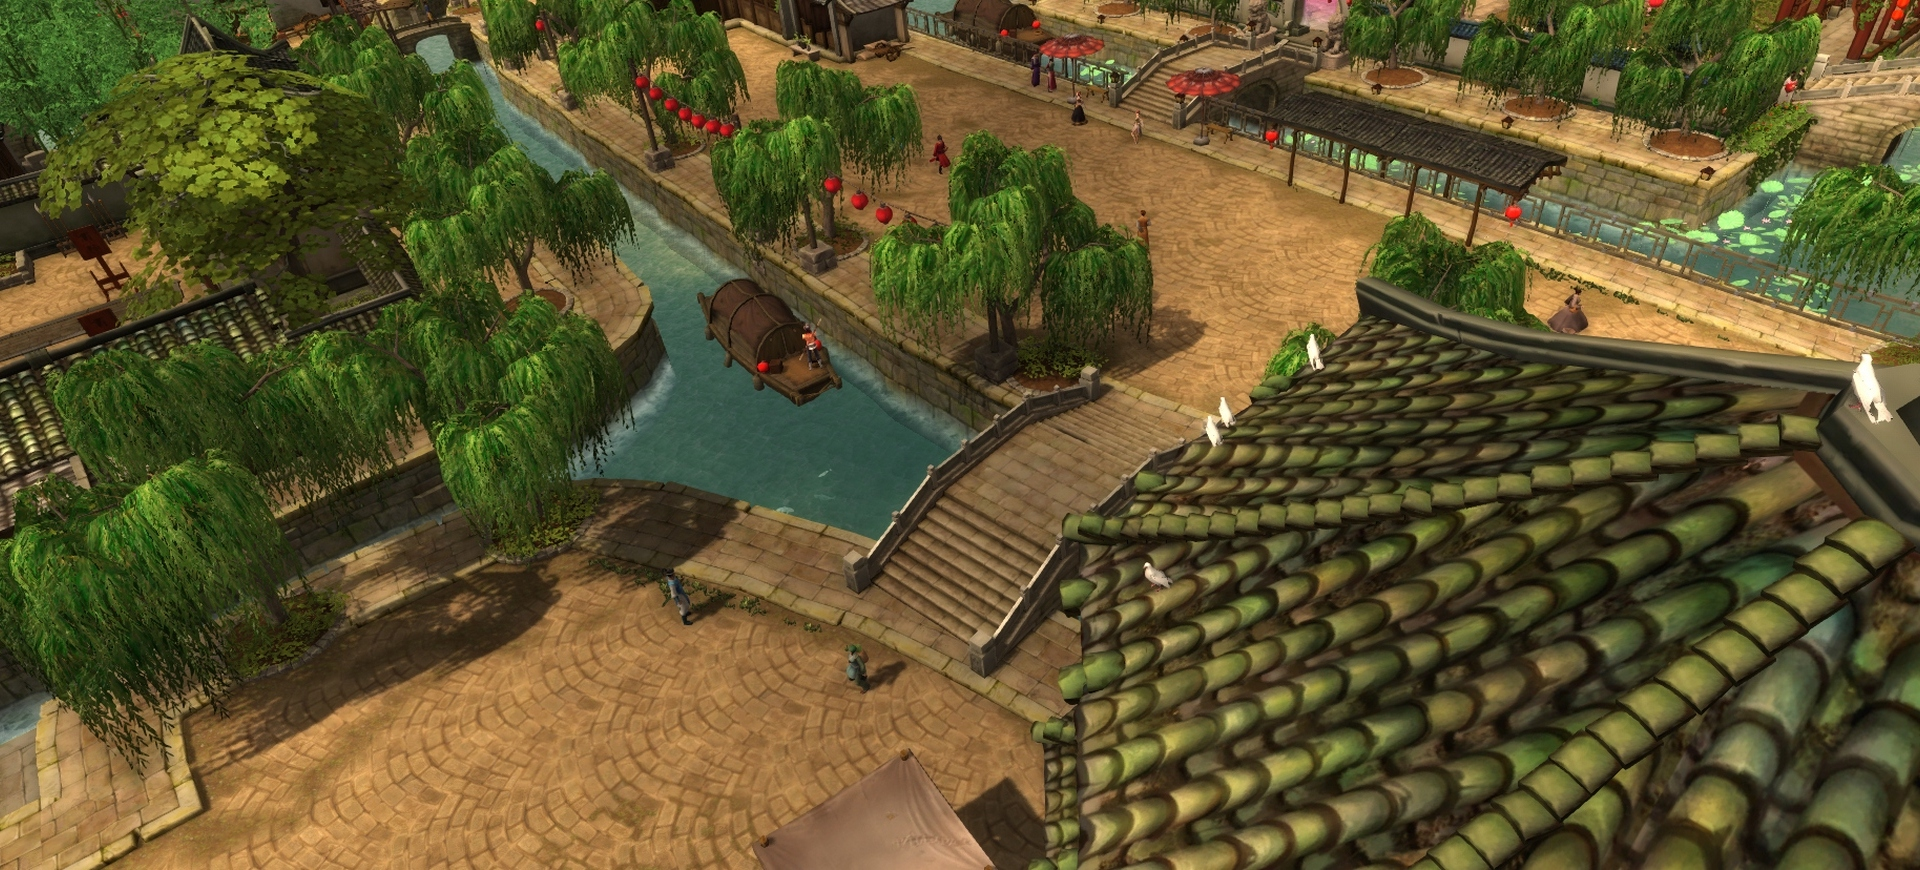 Tale of Wuxia - Đánh Giá Game